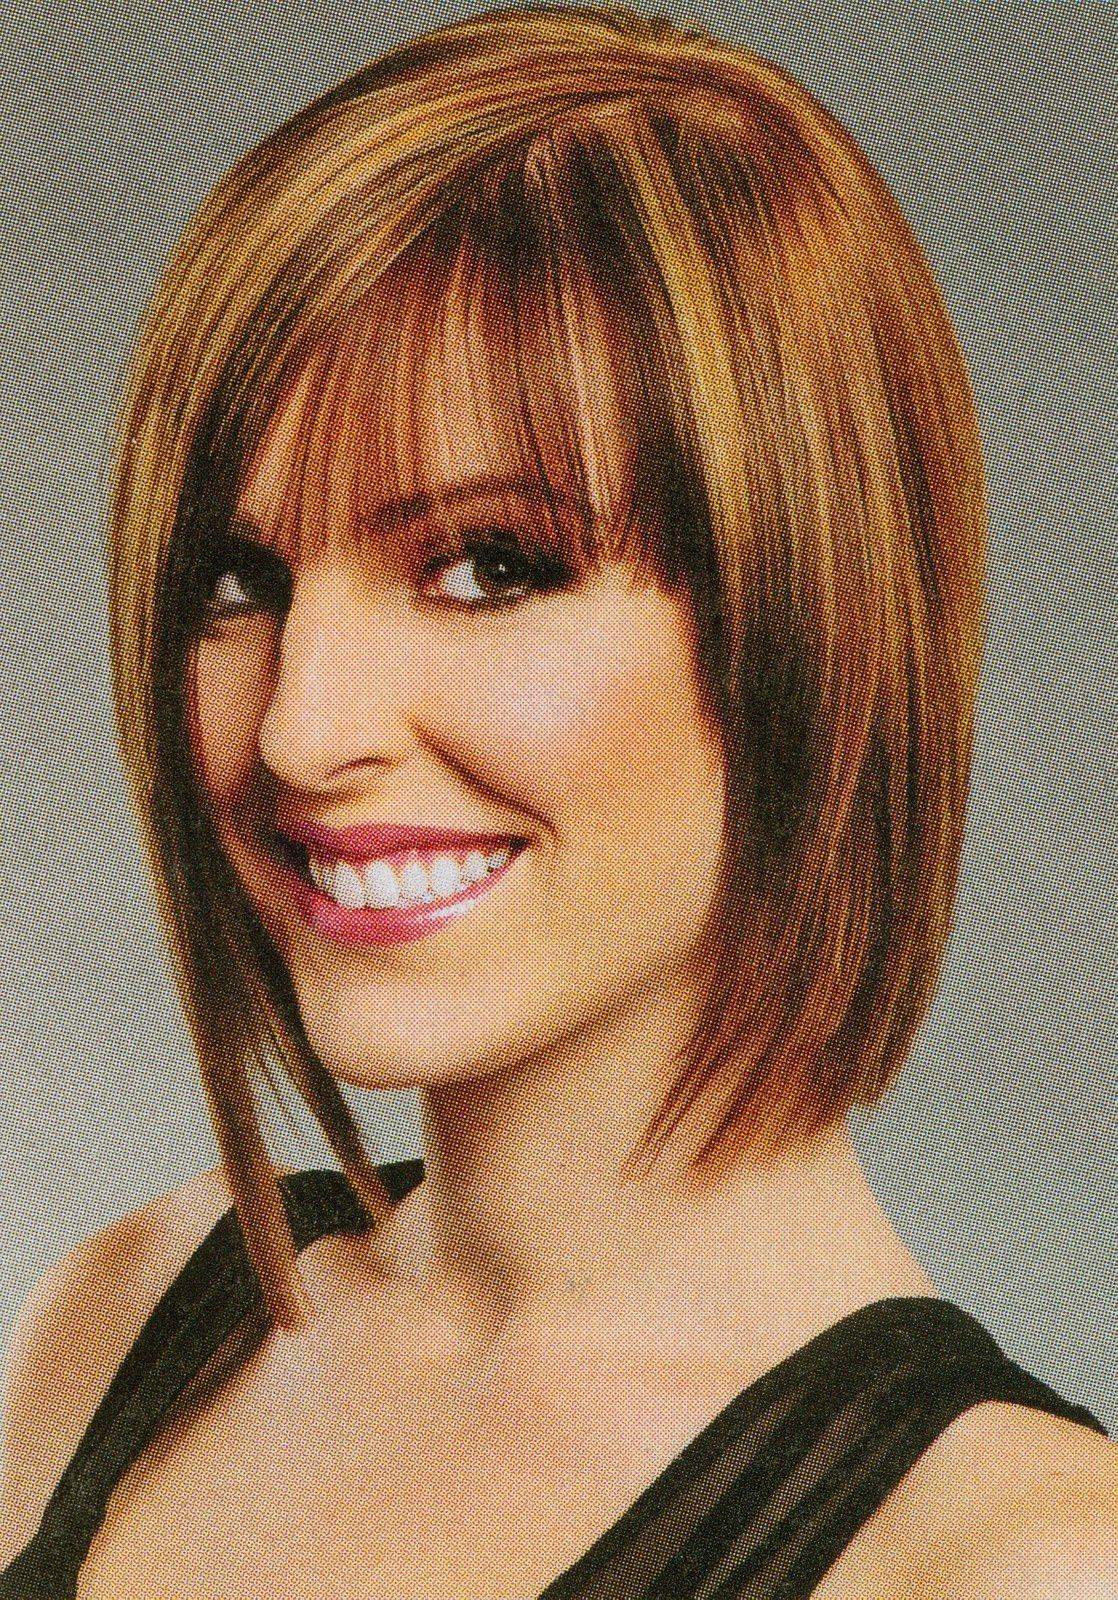 25 Layered Bob Haircut Ideas Designs  Hairstyles  Design Trends  Premium PSD Vector Downloads